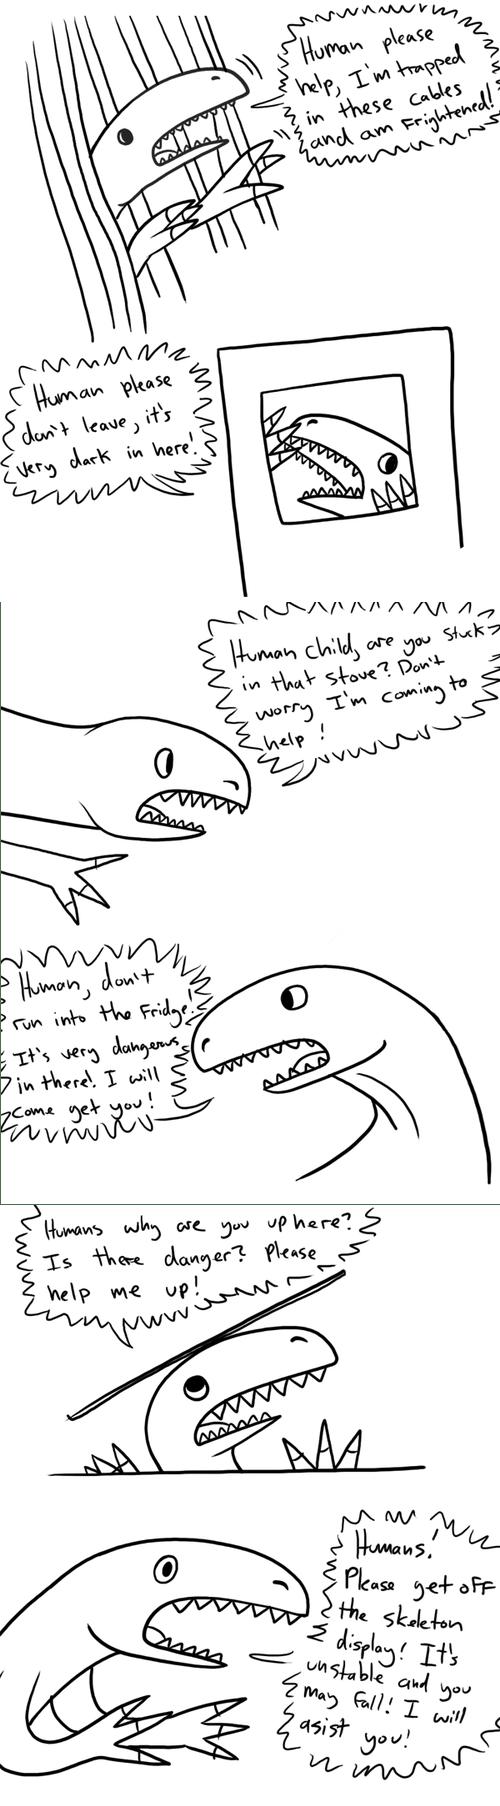 velociraptors,jurassic park,dinosaurs,web comics